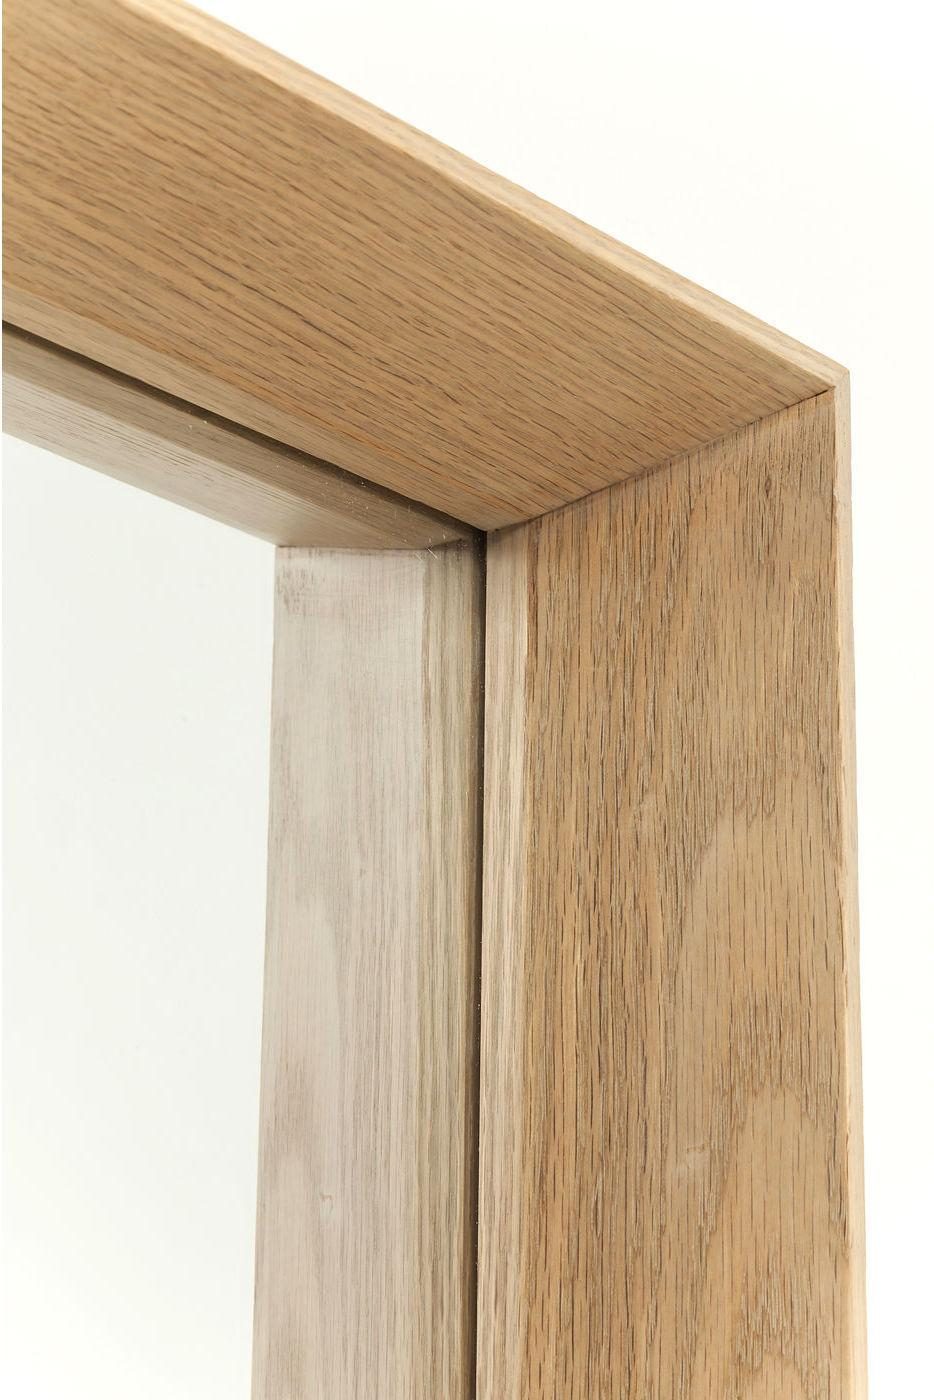 kare design spiegel montreal 160x60cm meubelen verlichting. Black Bedroom Furniture Sets. Home Design Ideas